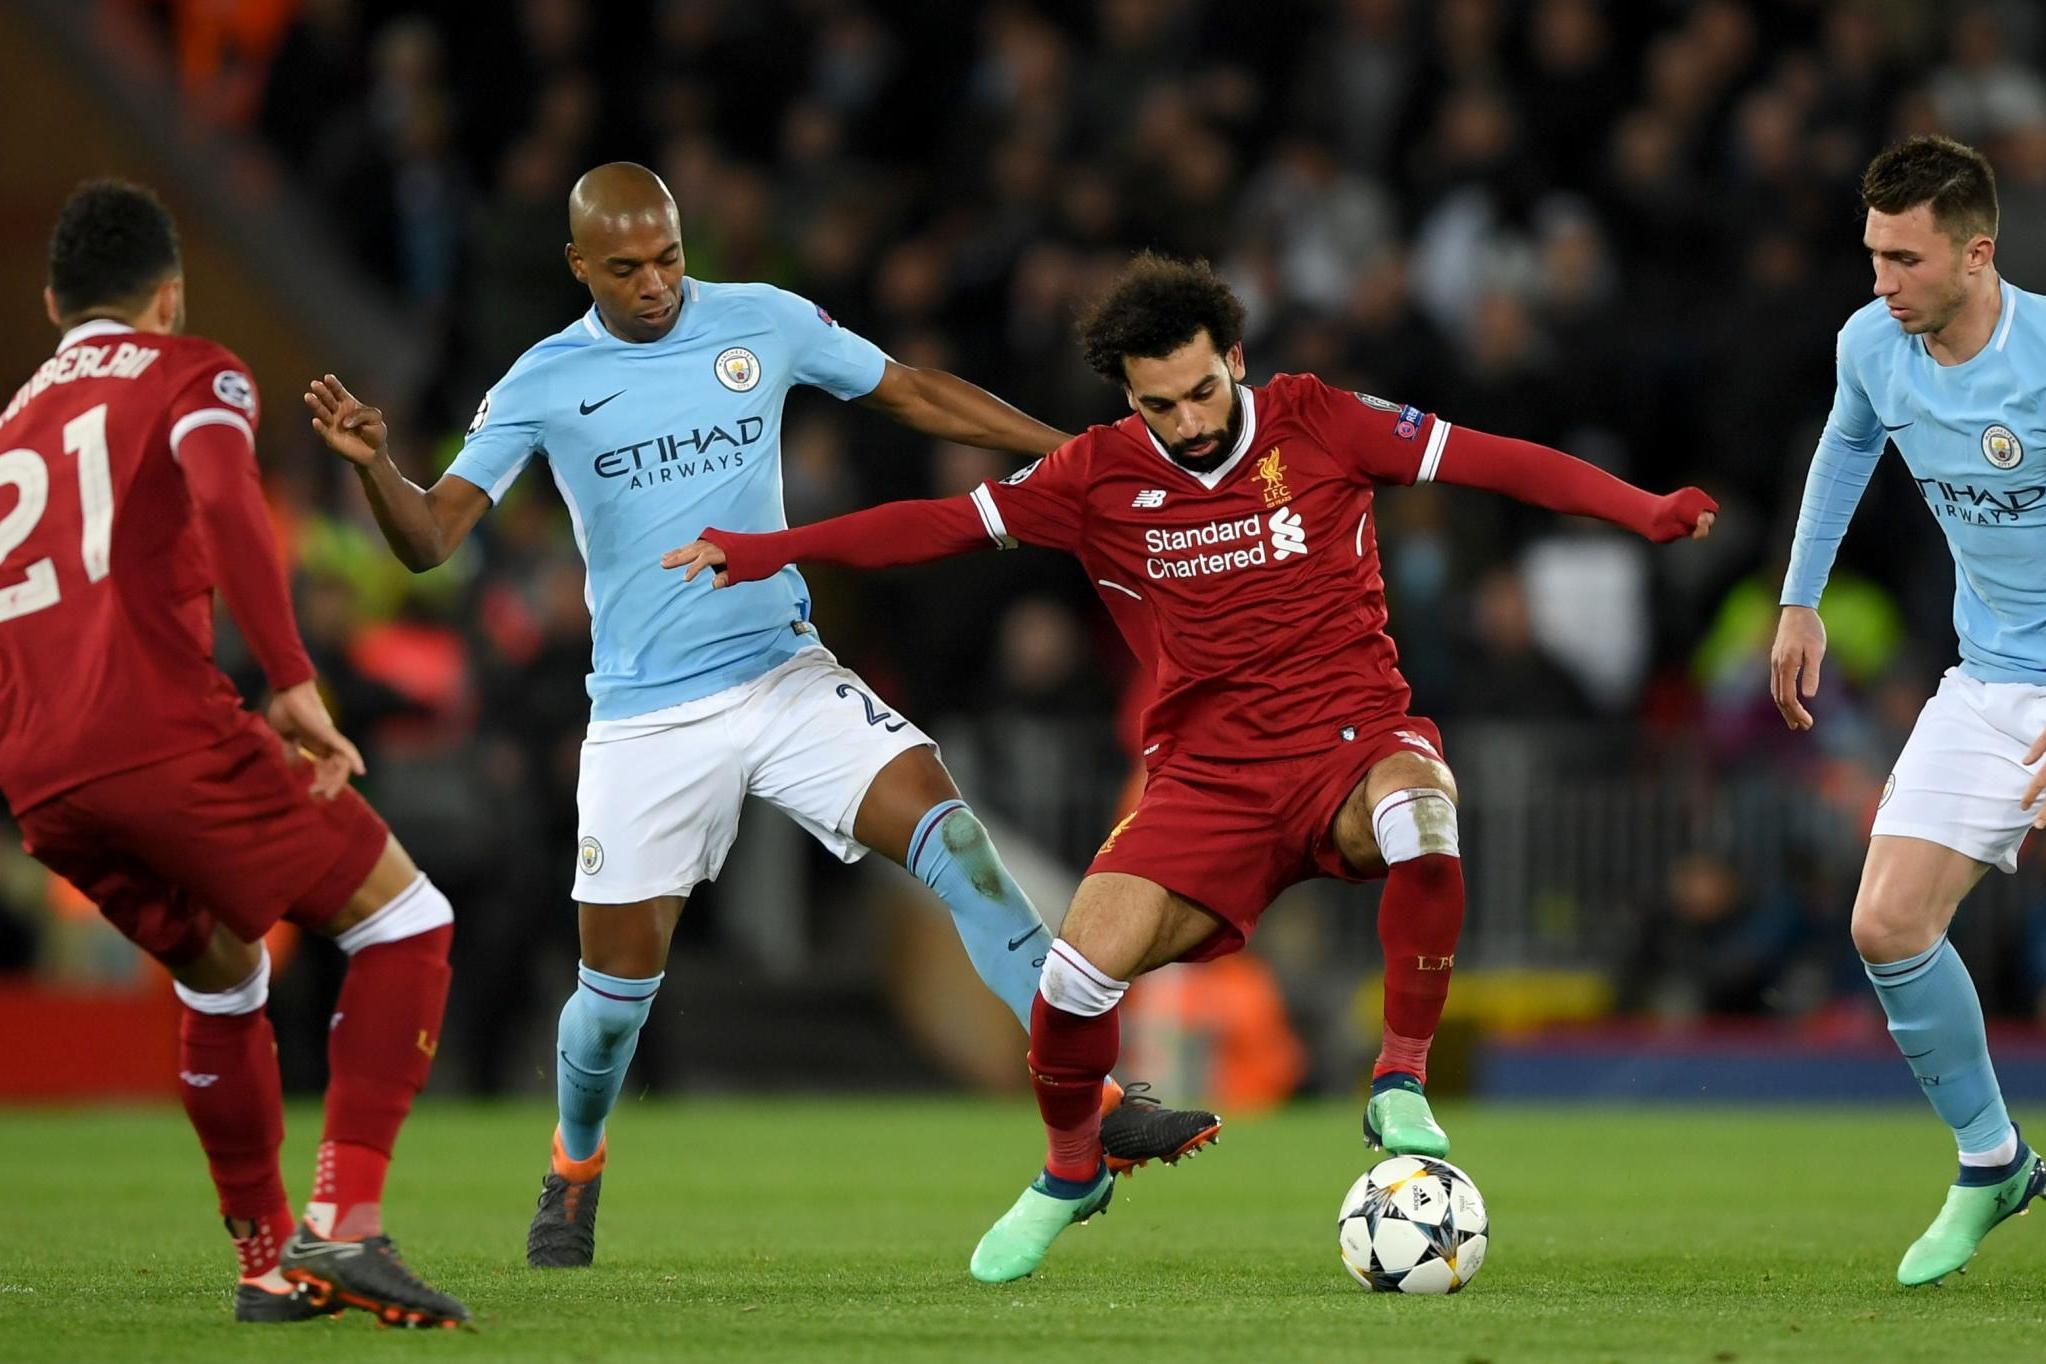 Manchester City Liverpool maçı hangi kanalda?